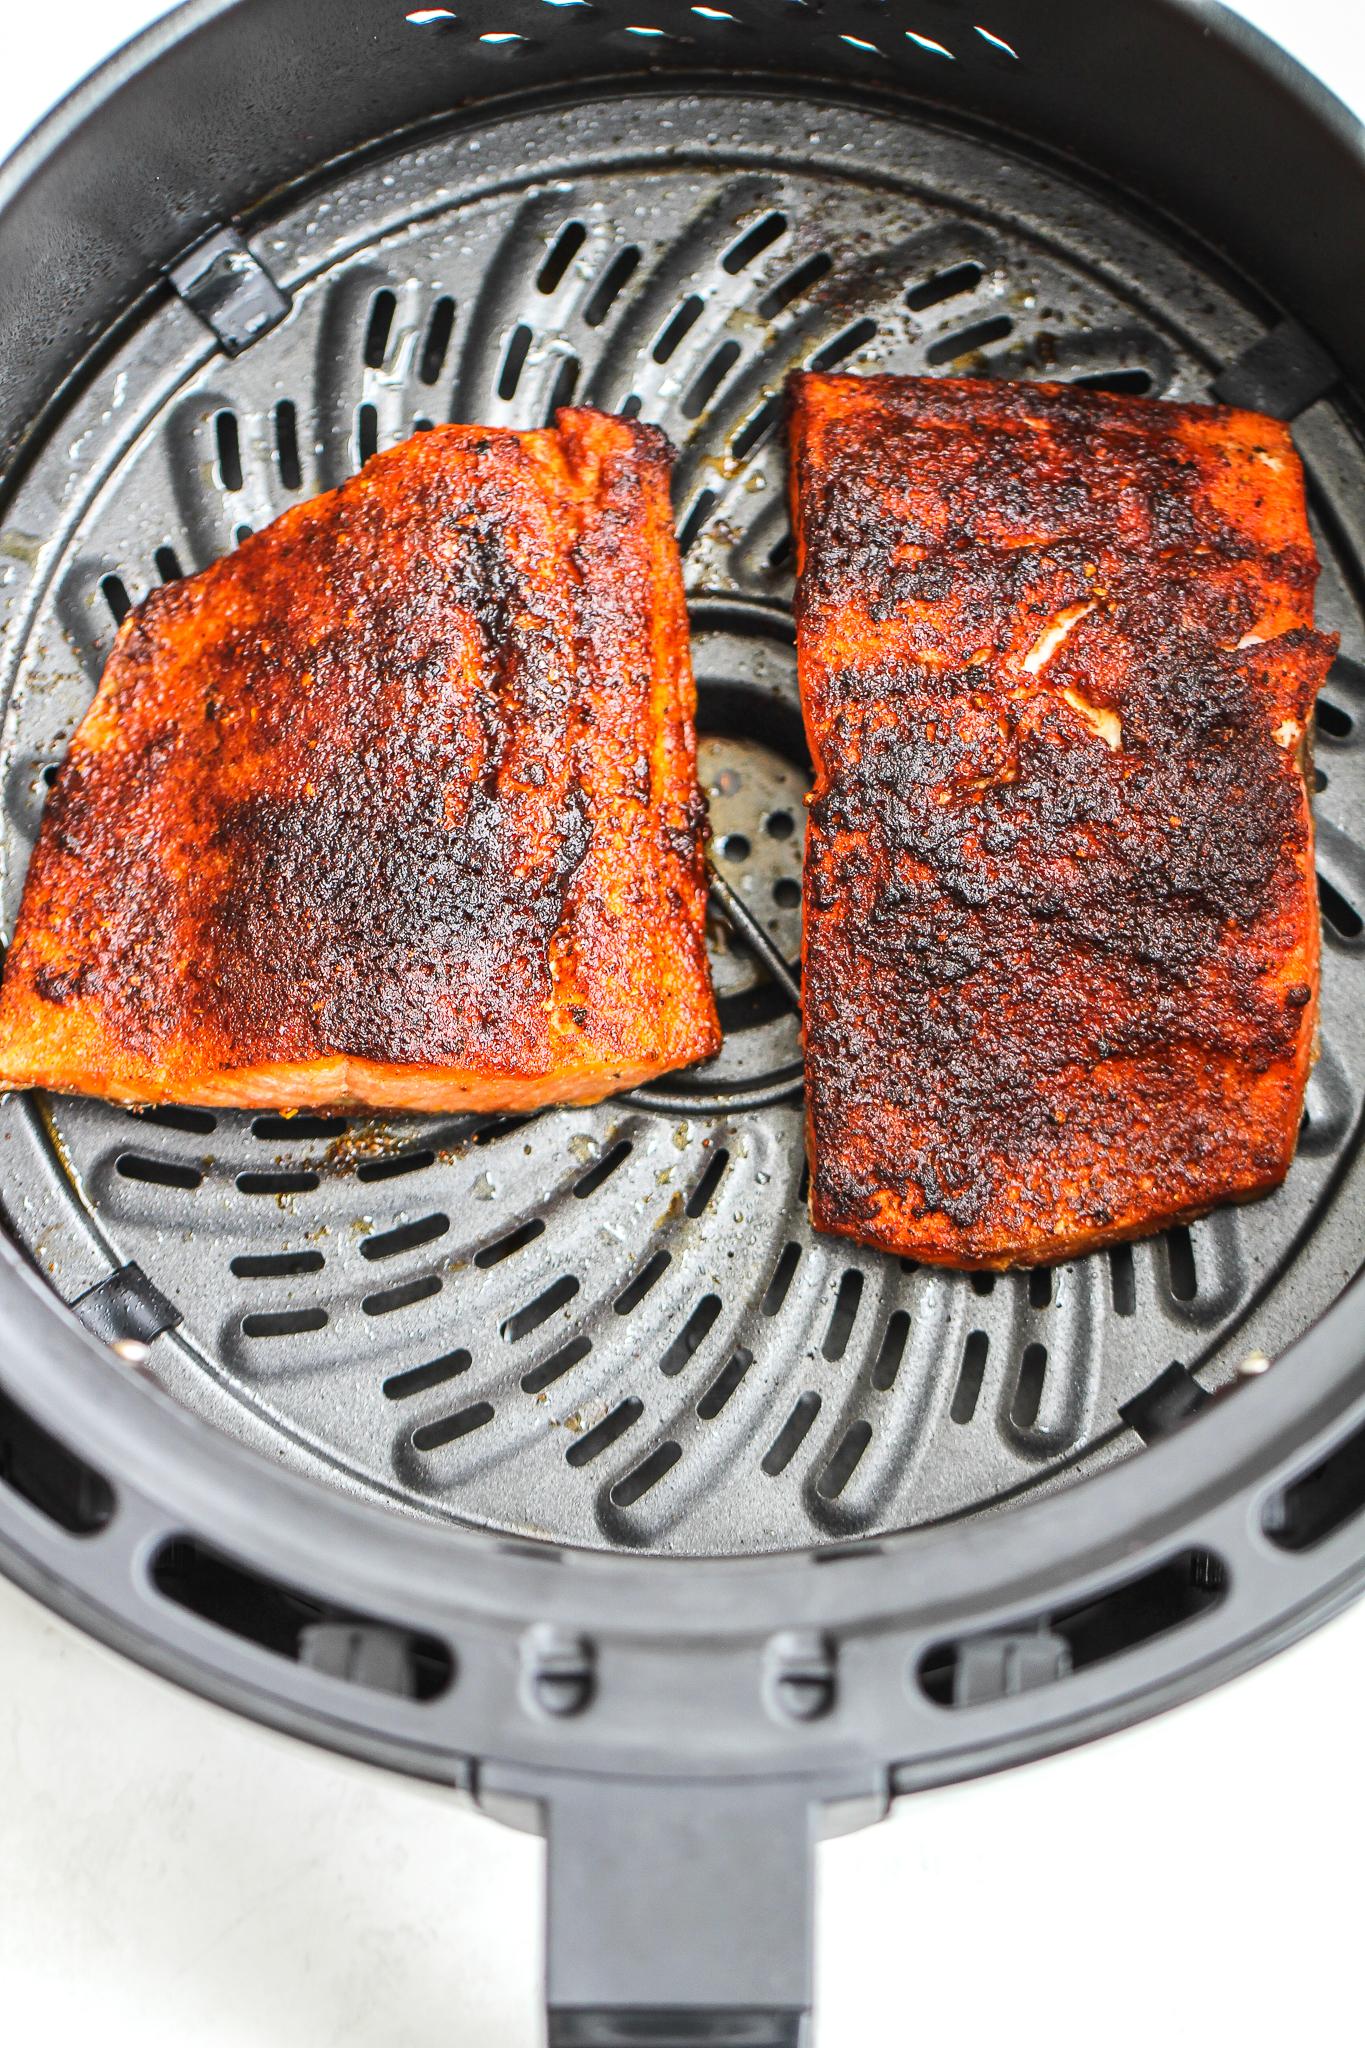 Cooked air fryer blackened salmon in an air fryer basket